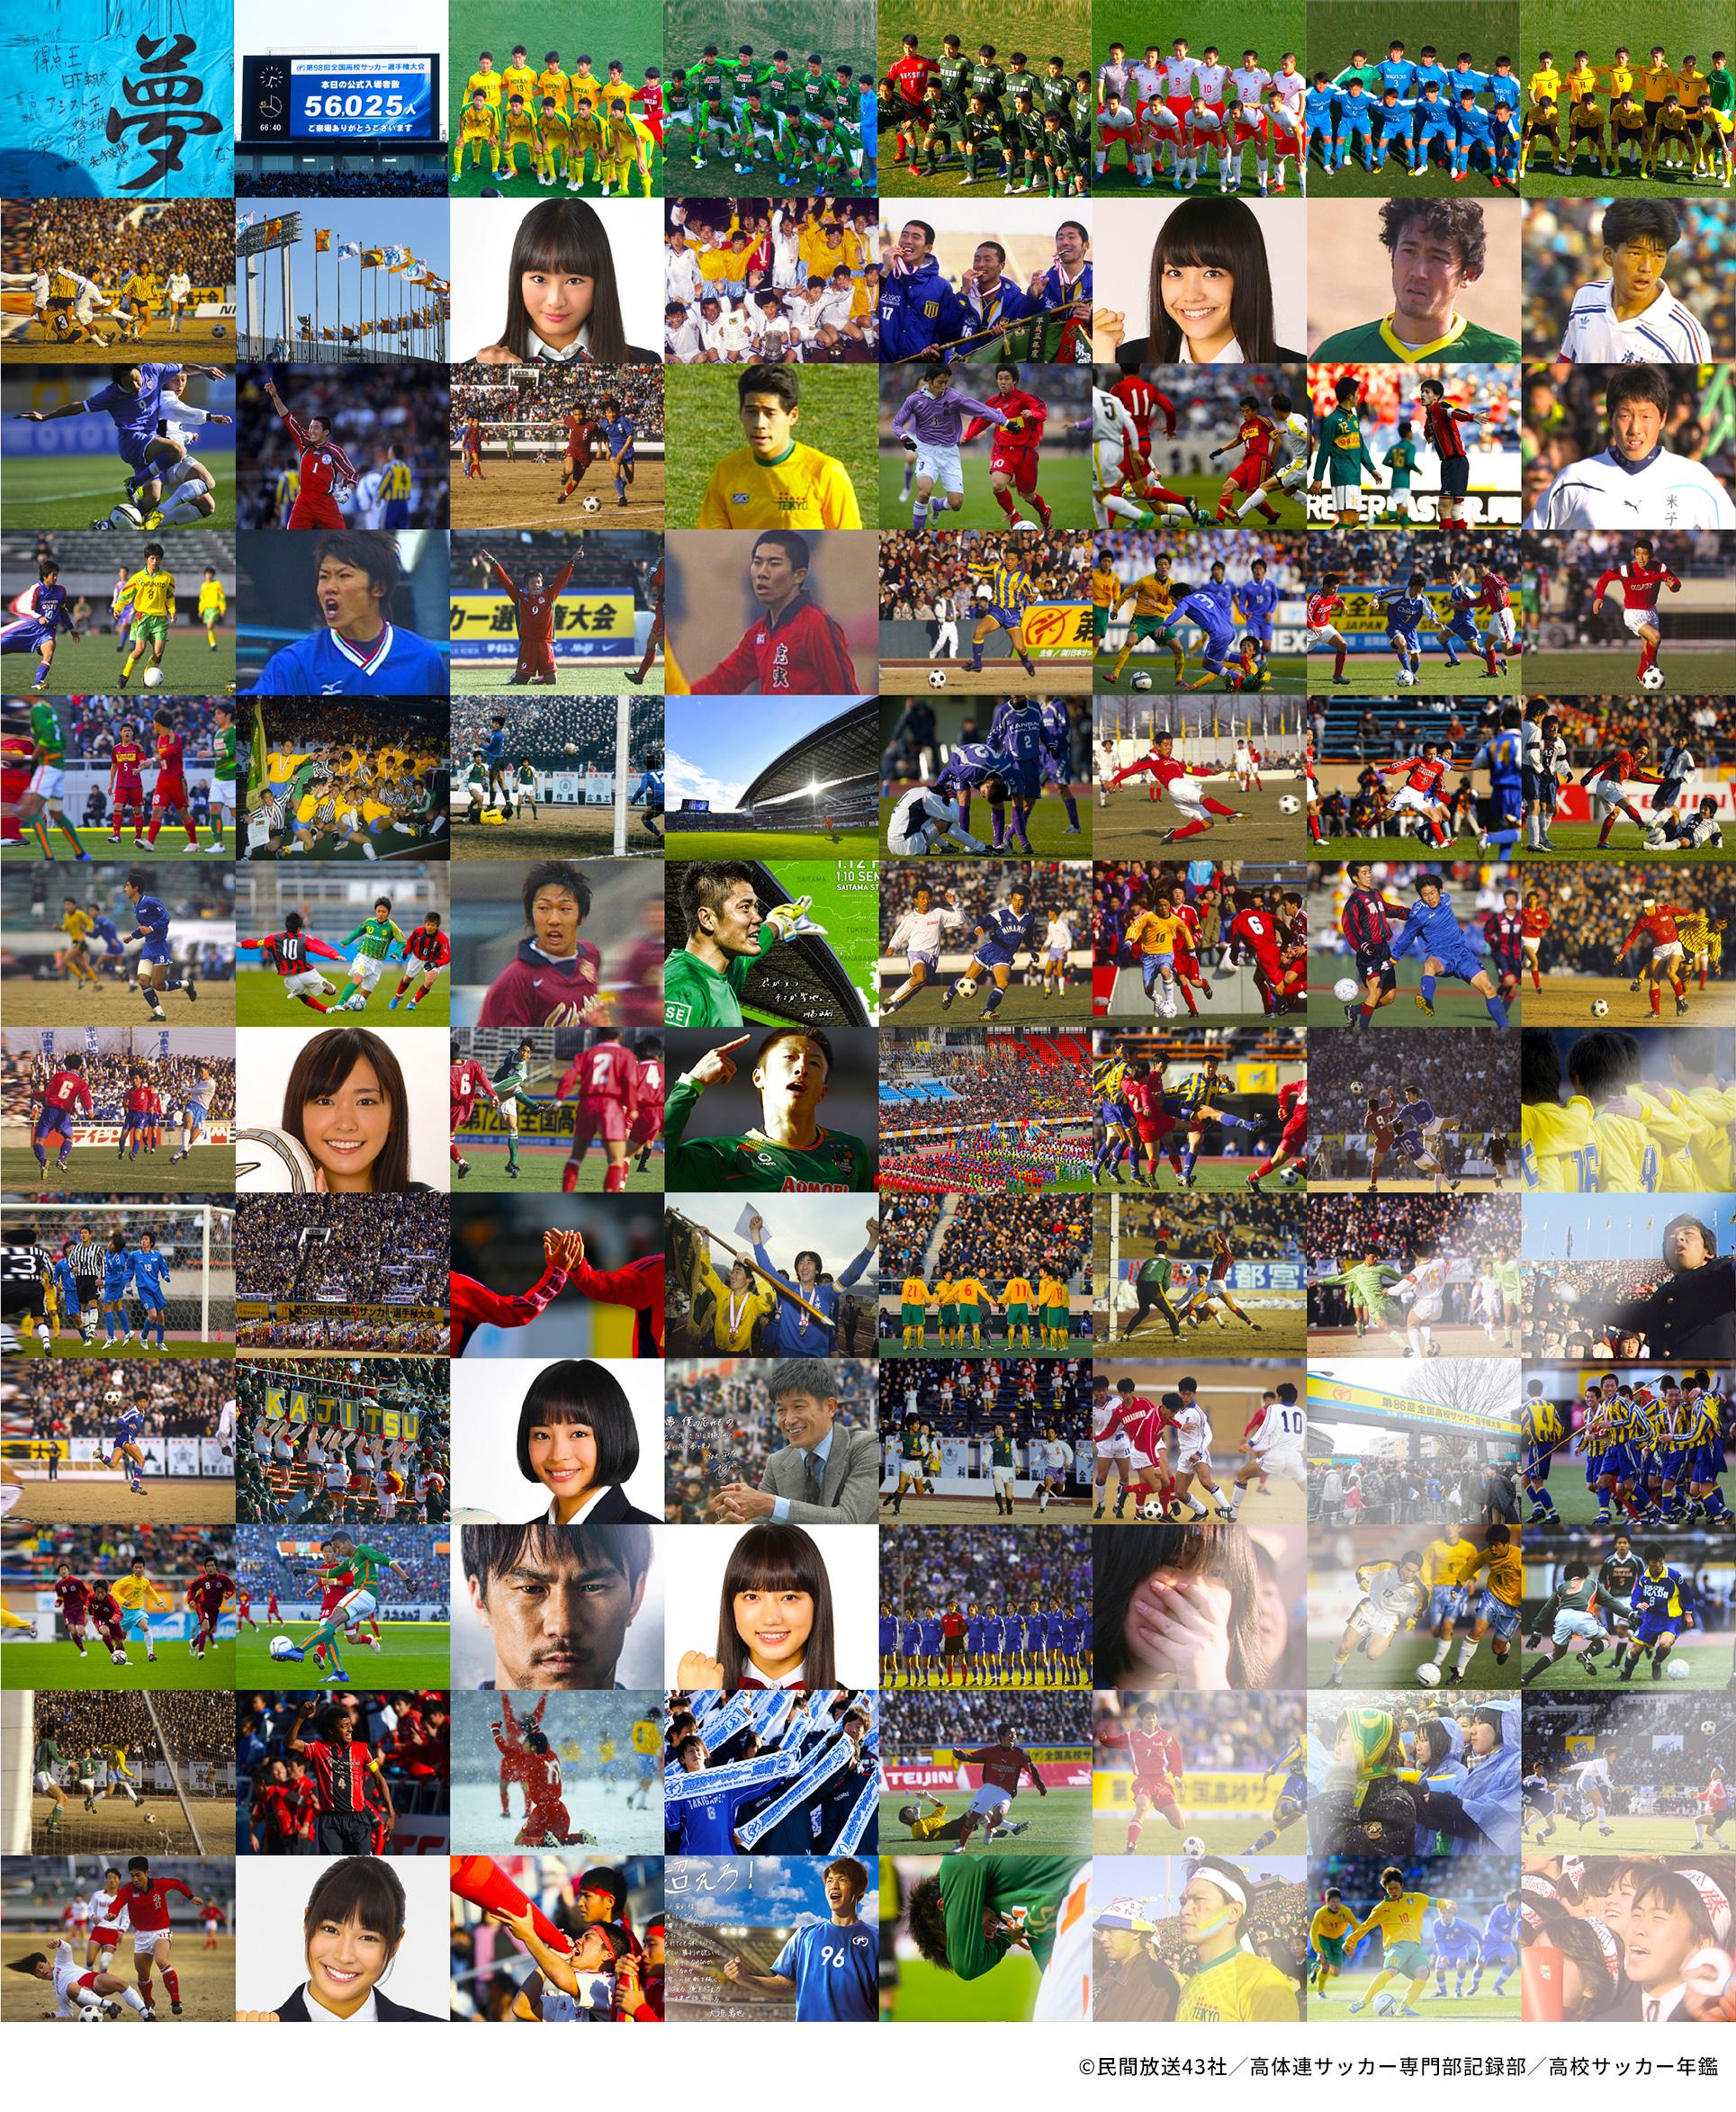 99 選手権 高校 第 全国 回 サッカー 大会要項|第99回全国高等学校サッカー選手権大会|大会・試合|JFA|日本サッカー協会